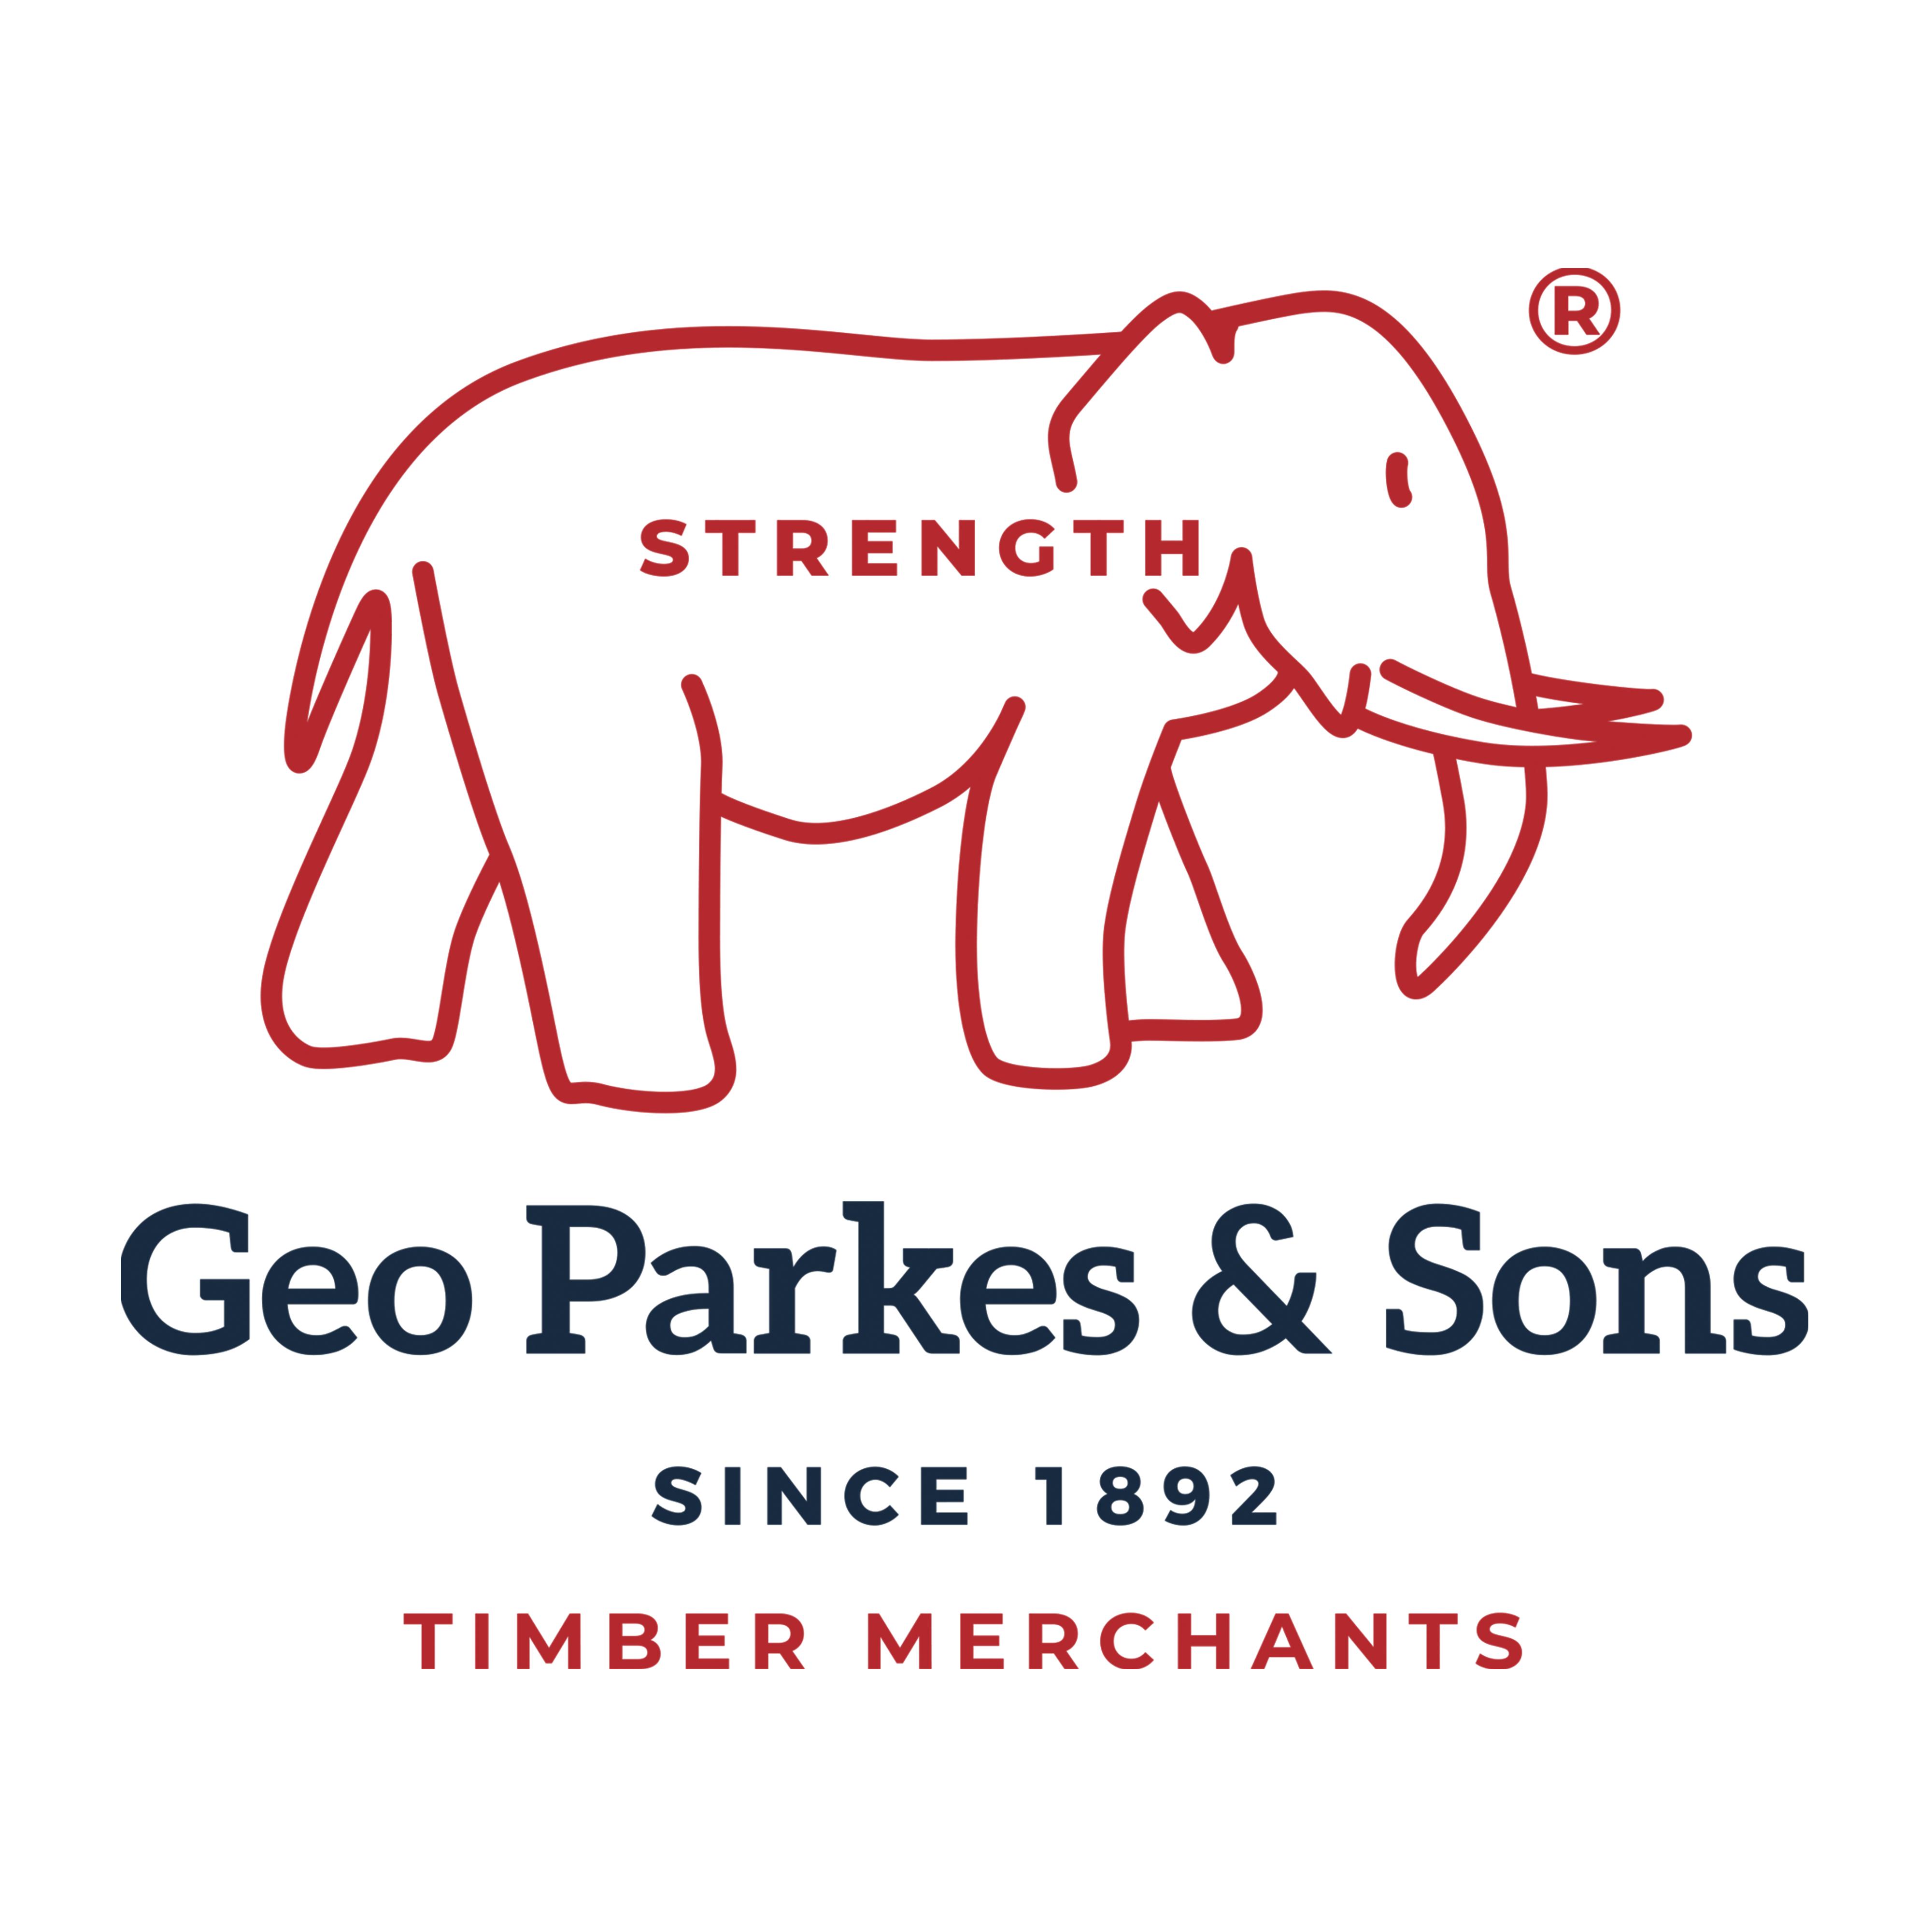 Geo Parkes & Sons